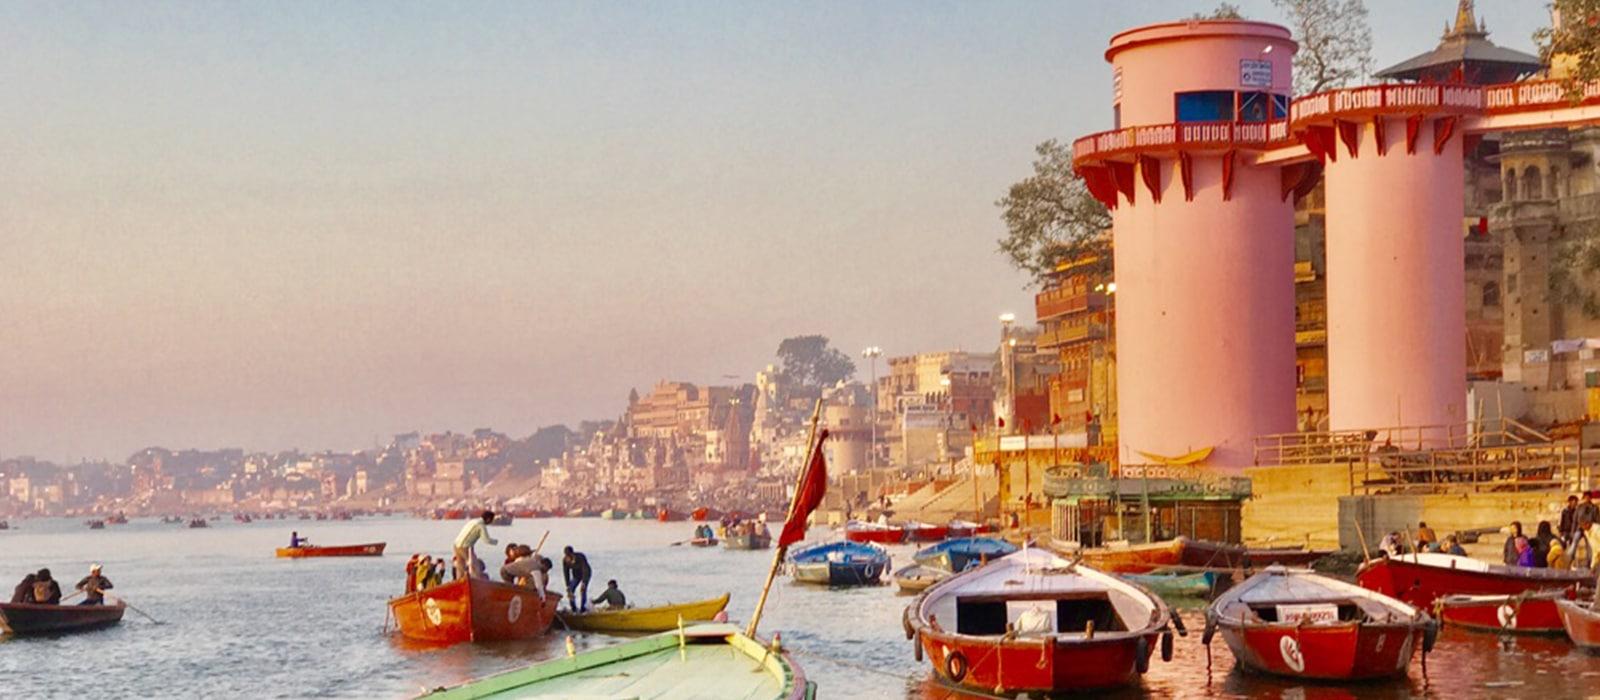 circuit kumbh mela 2019 - Varanasi, inde - Les Routes du Monde